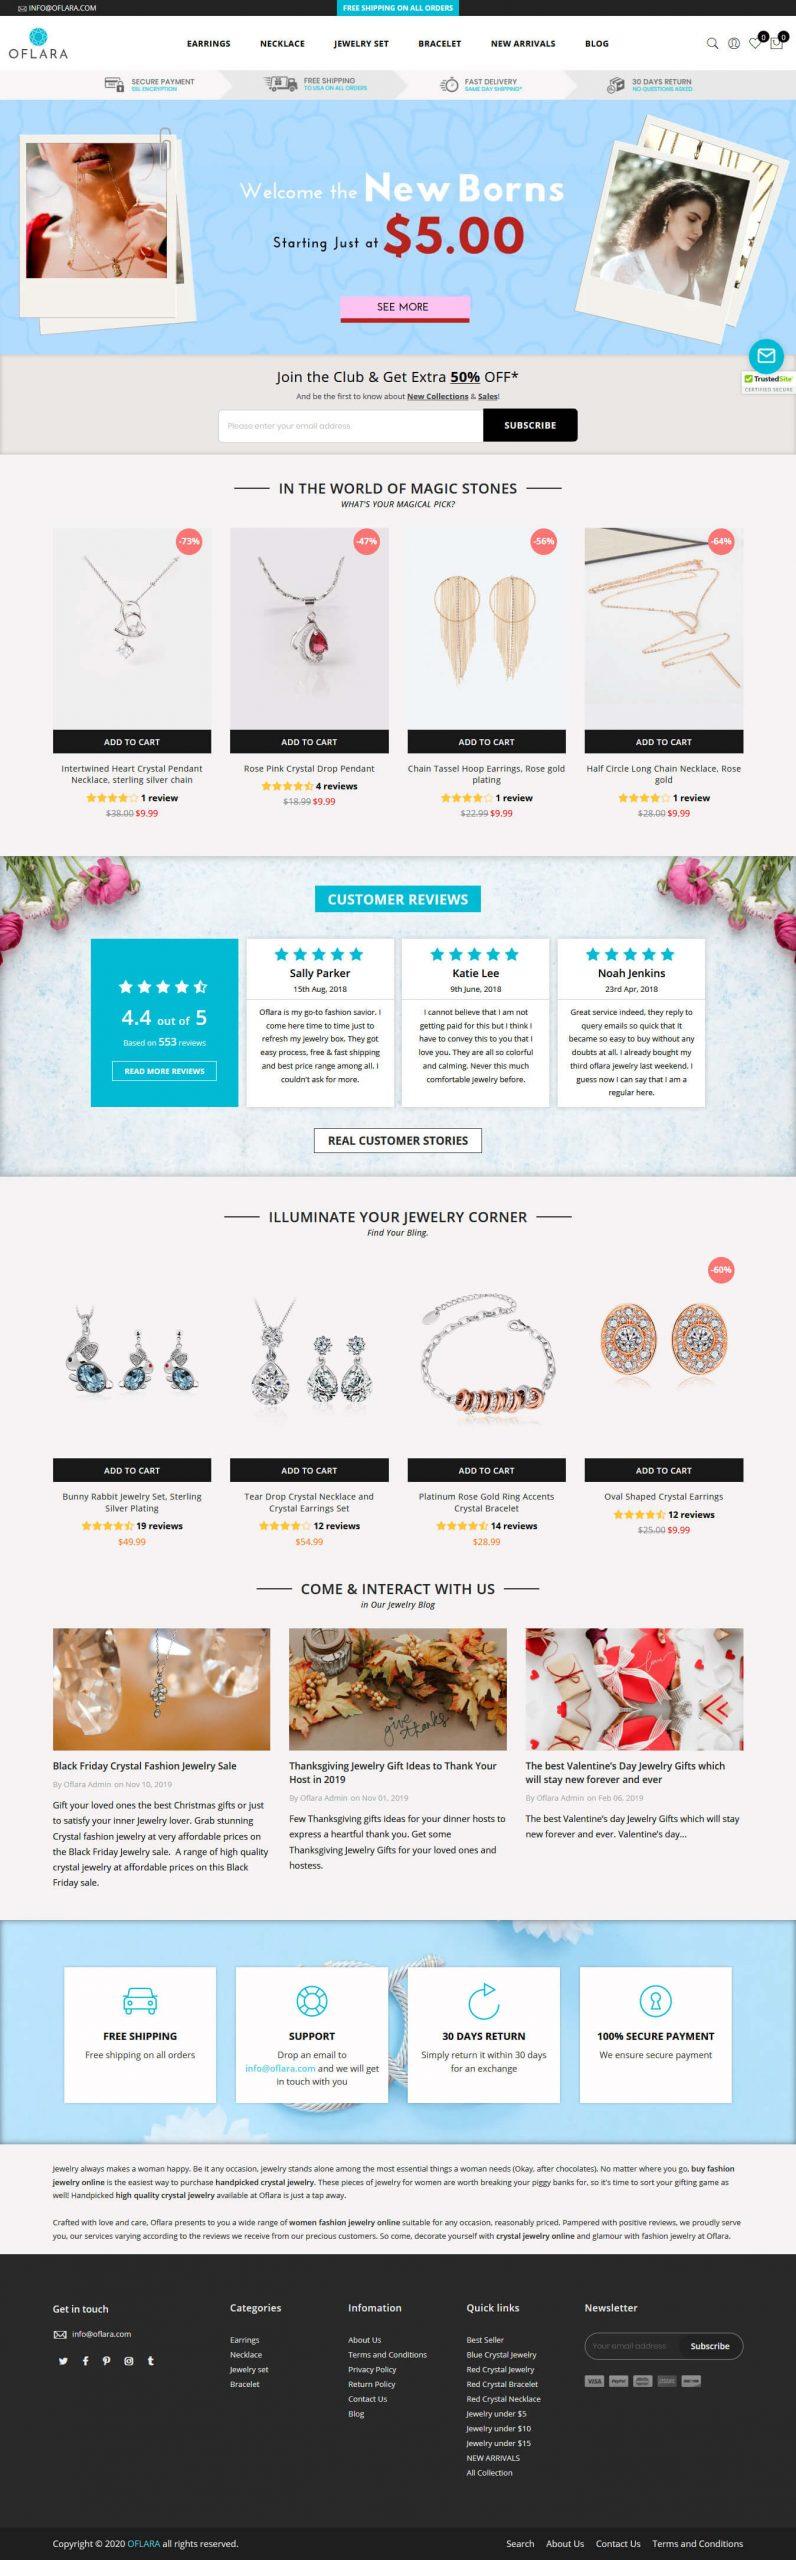 Shopify Homepage Design Conversion After - BrillMark